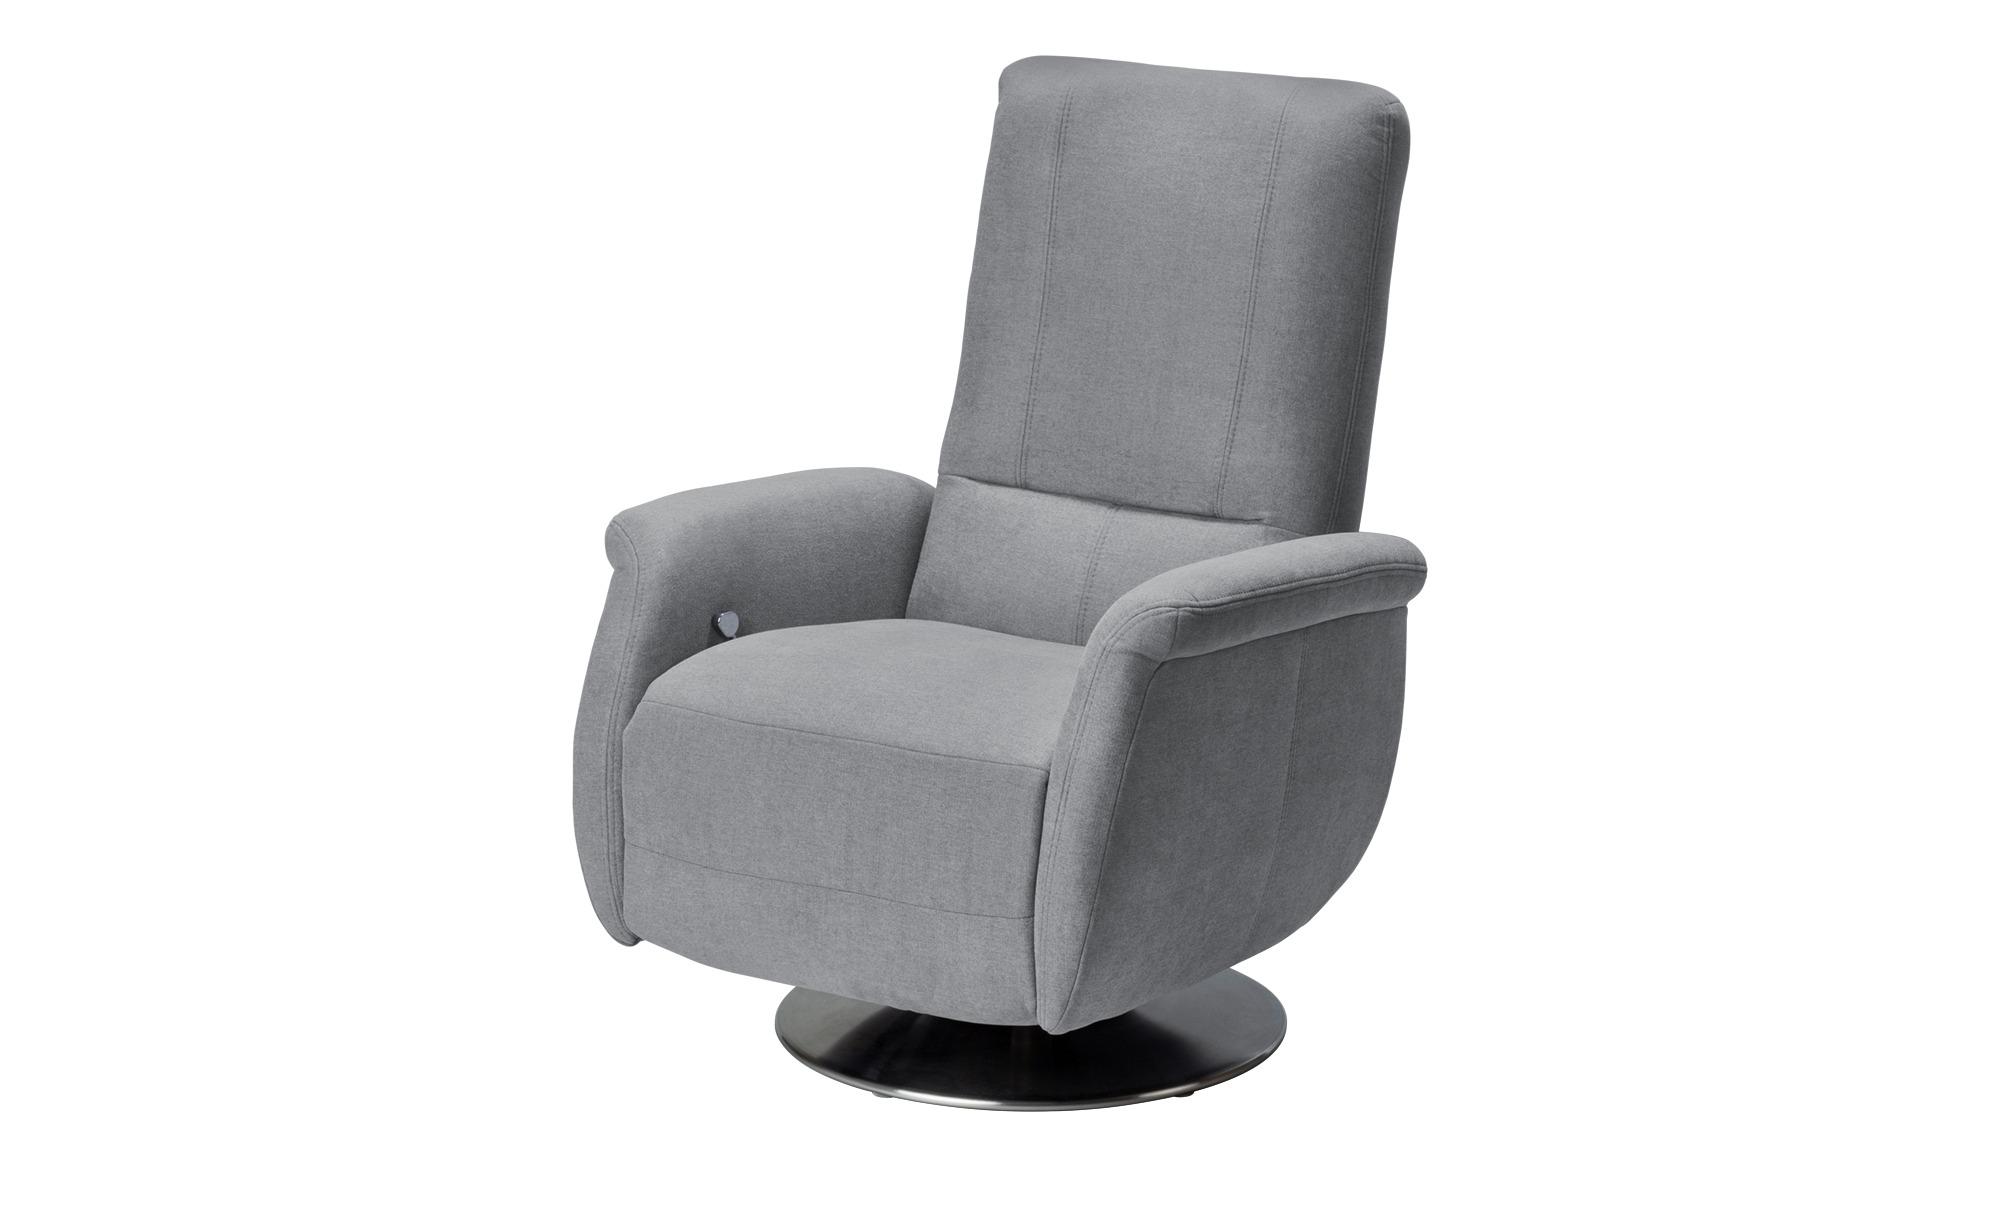 meinSofa Relaxsessel grau - Stoff Felix